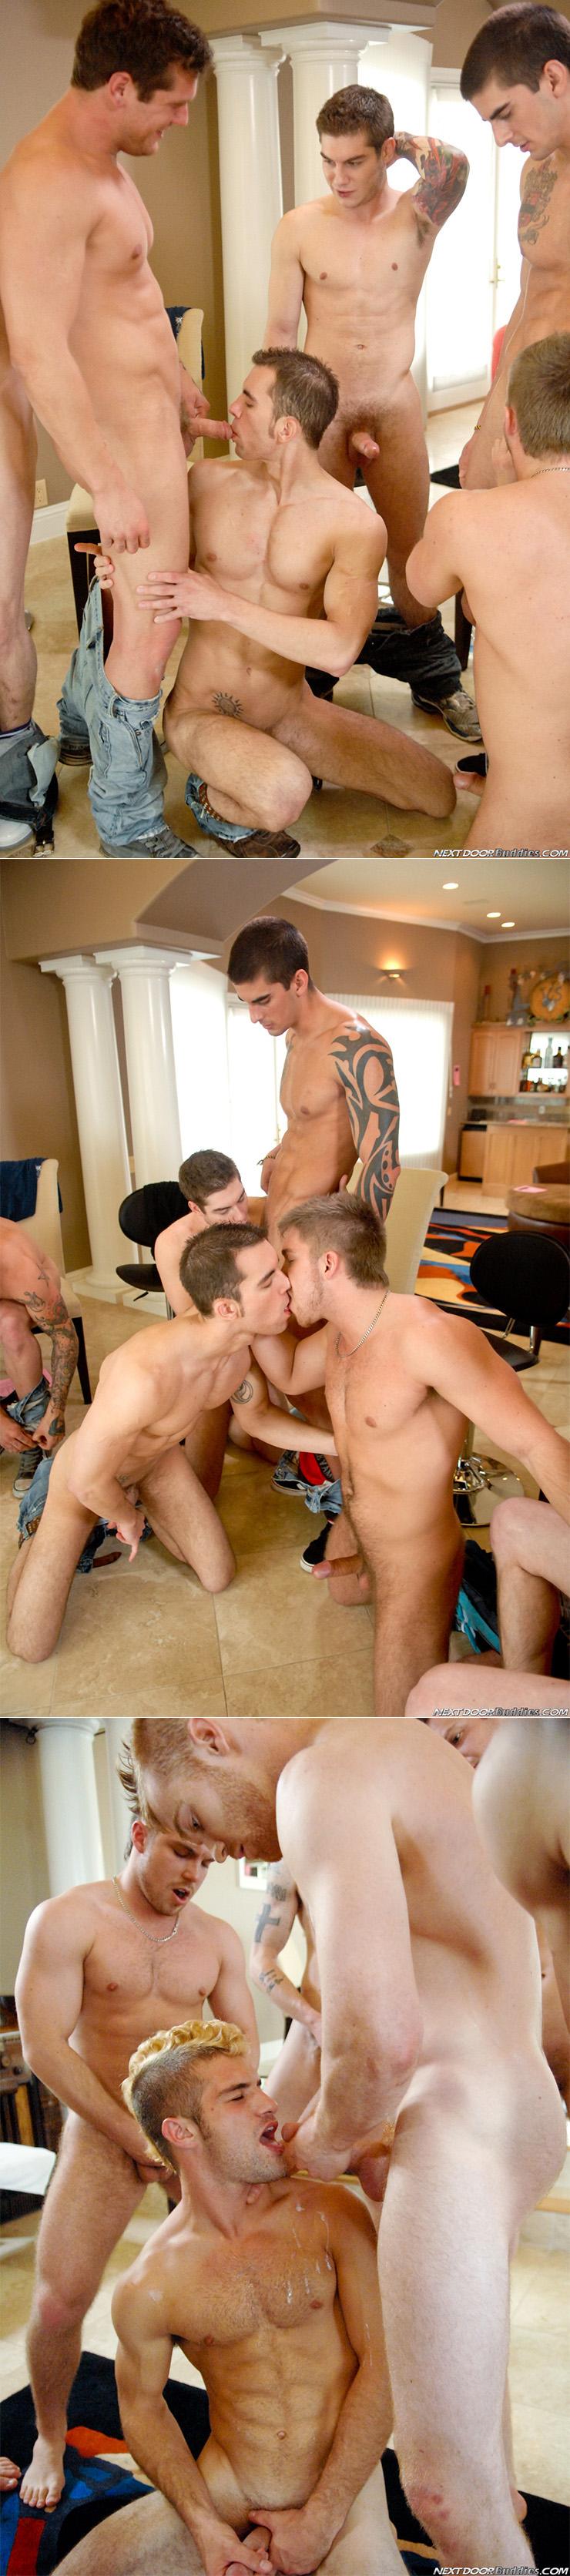 NextDoorBuddies The Rectodus Society Gay Condom Orgy Male Feet Big Cocks Group Sex Bukkake Incl Tyler Torro James Jamesson Adam Wirthmore 1